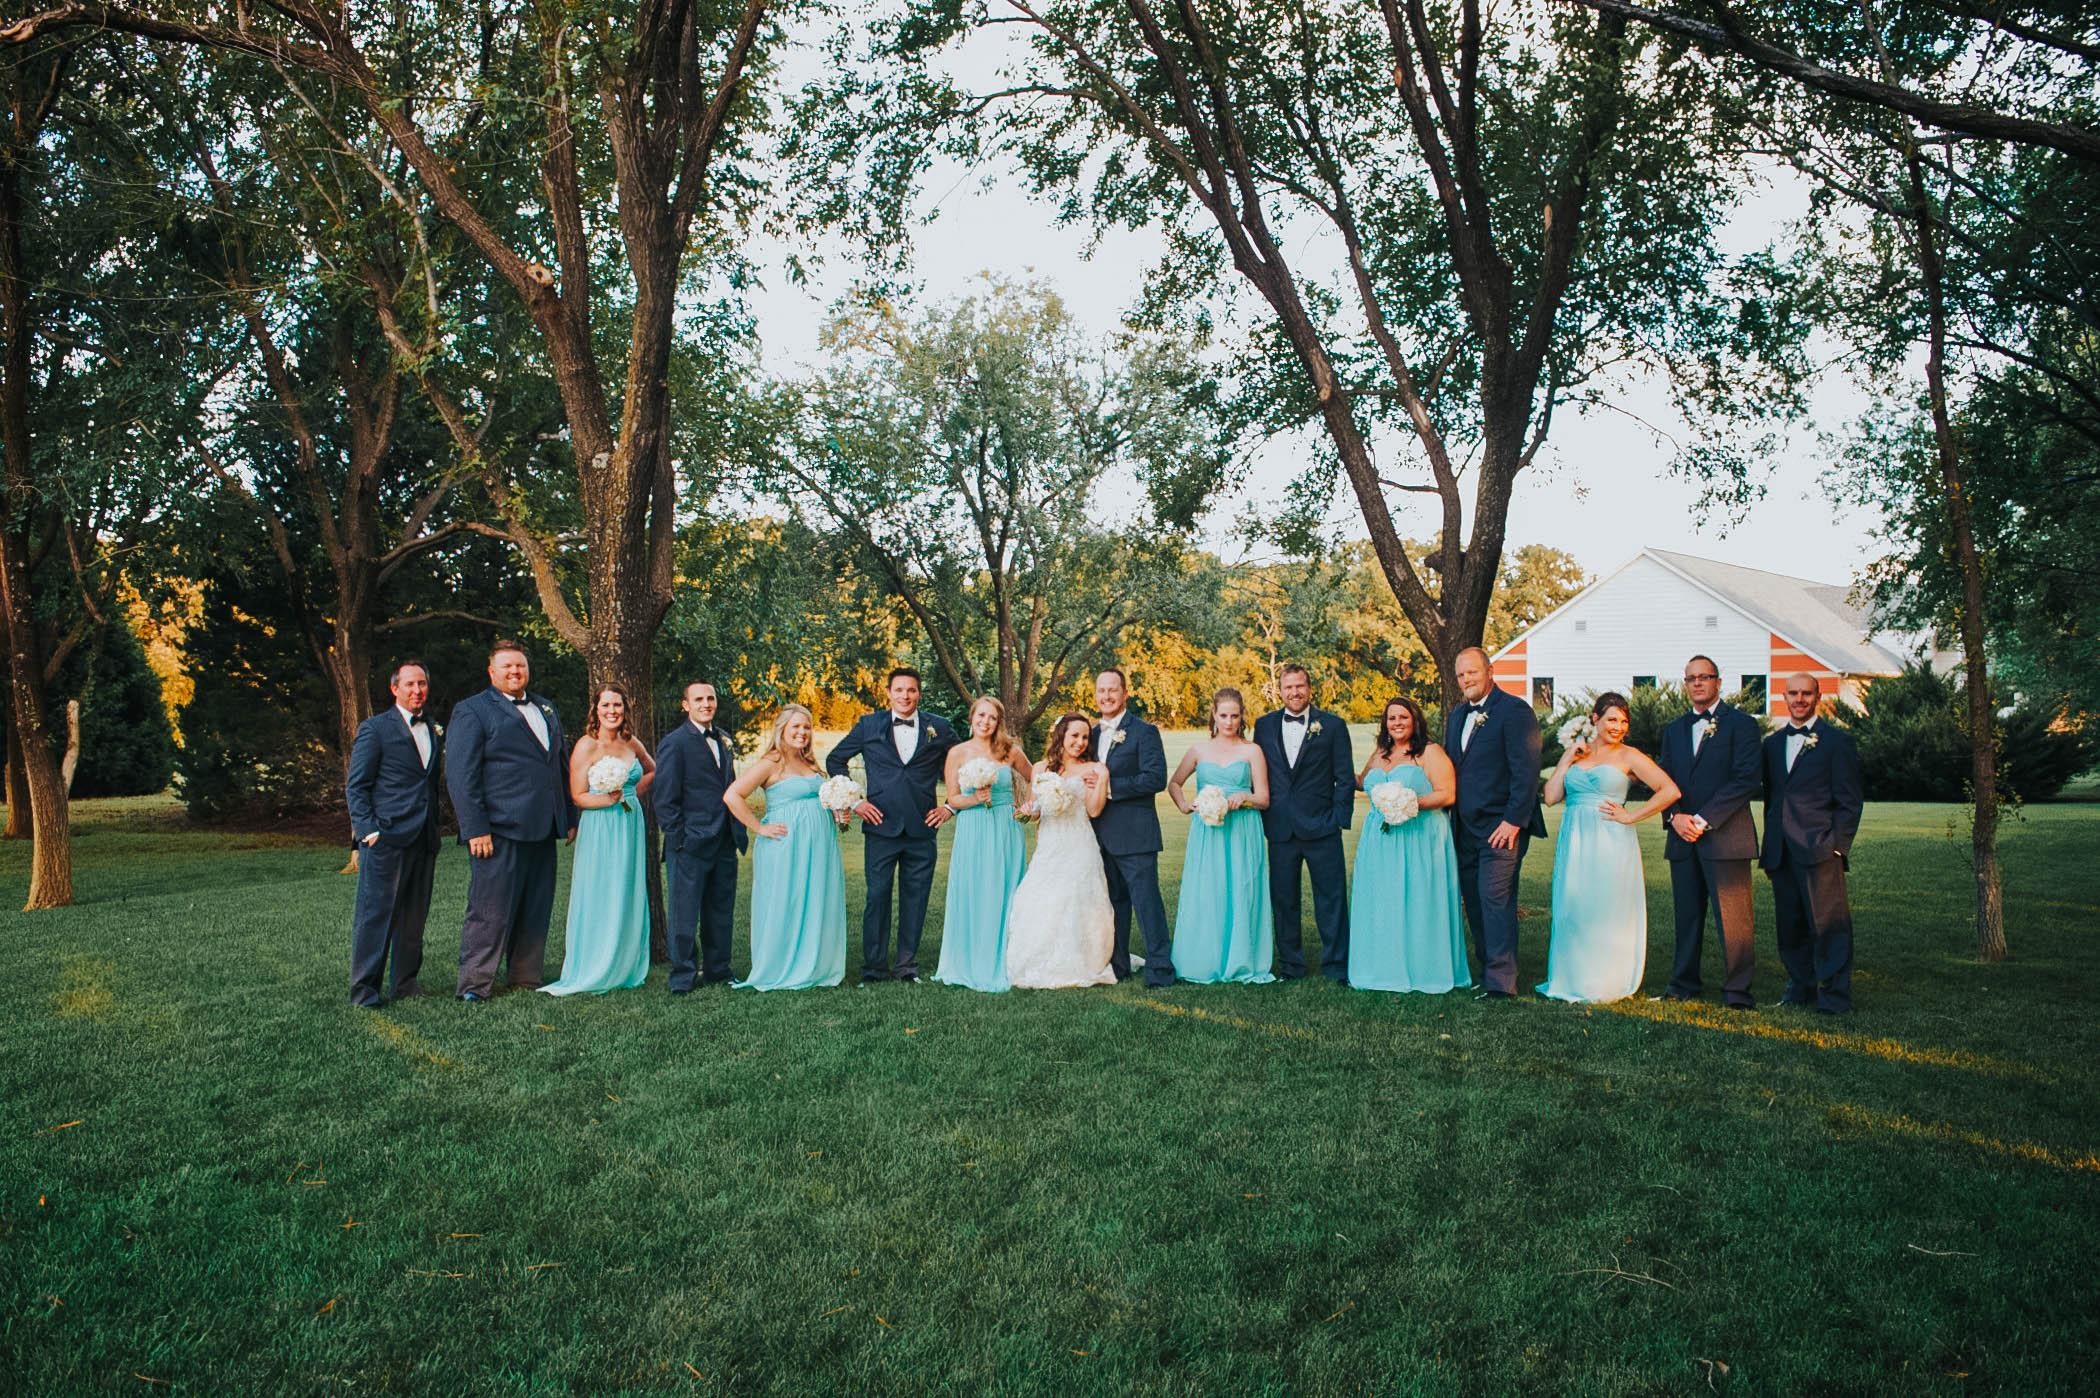 Whidbey-Island-Wedding-Photographer-J-Hodges (6 of 8)-2.jpg